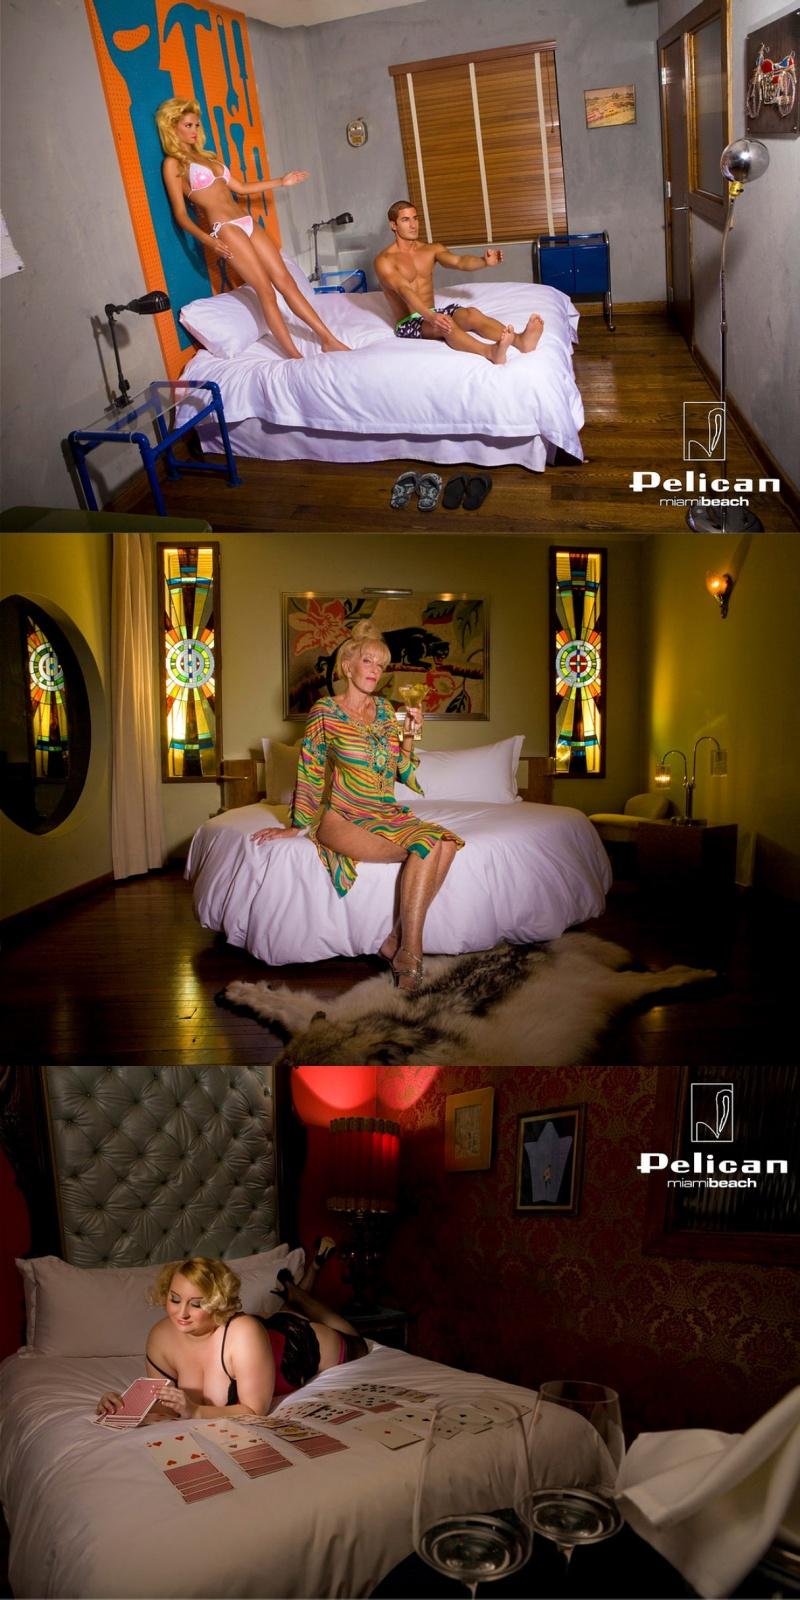 Male model photo shoot of Richard Cordero in Pelican Hotel, Miami Beach